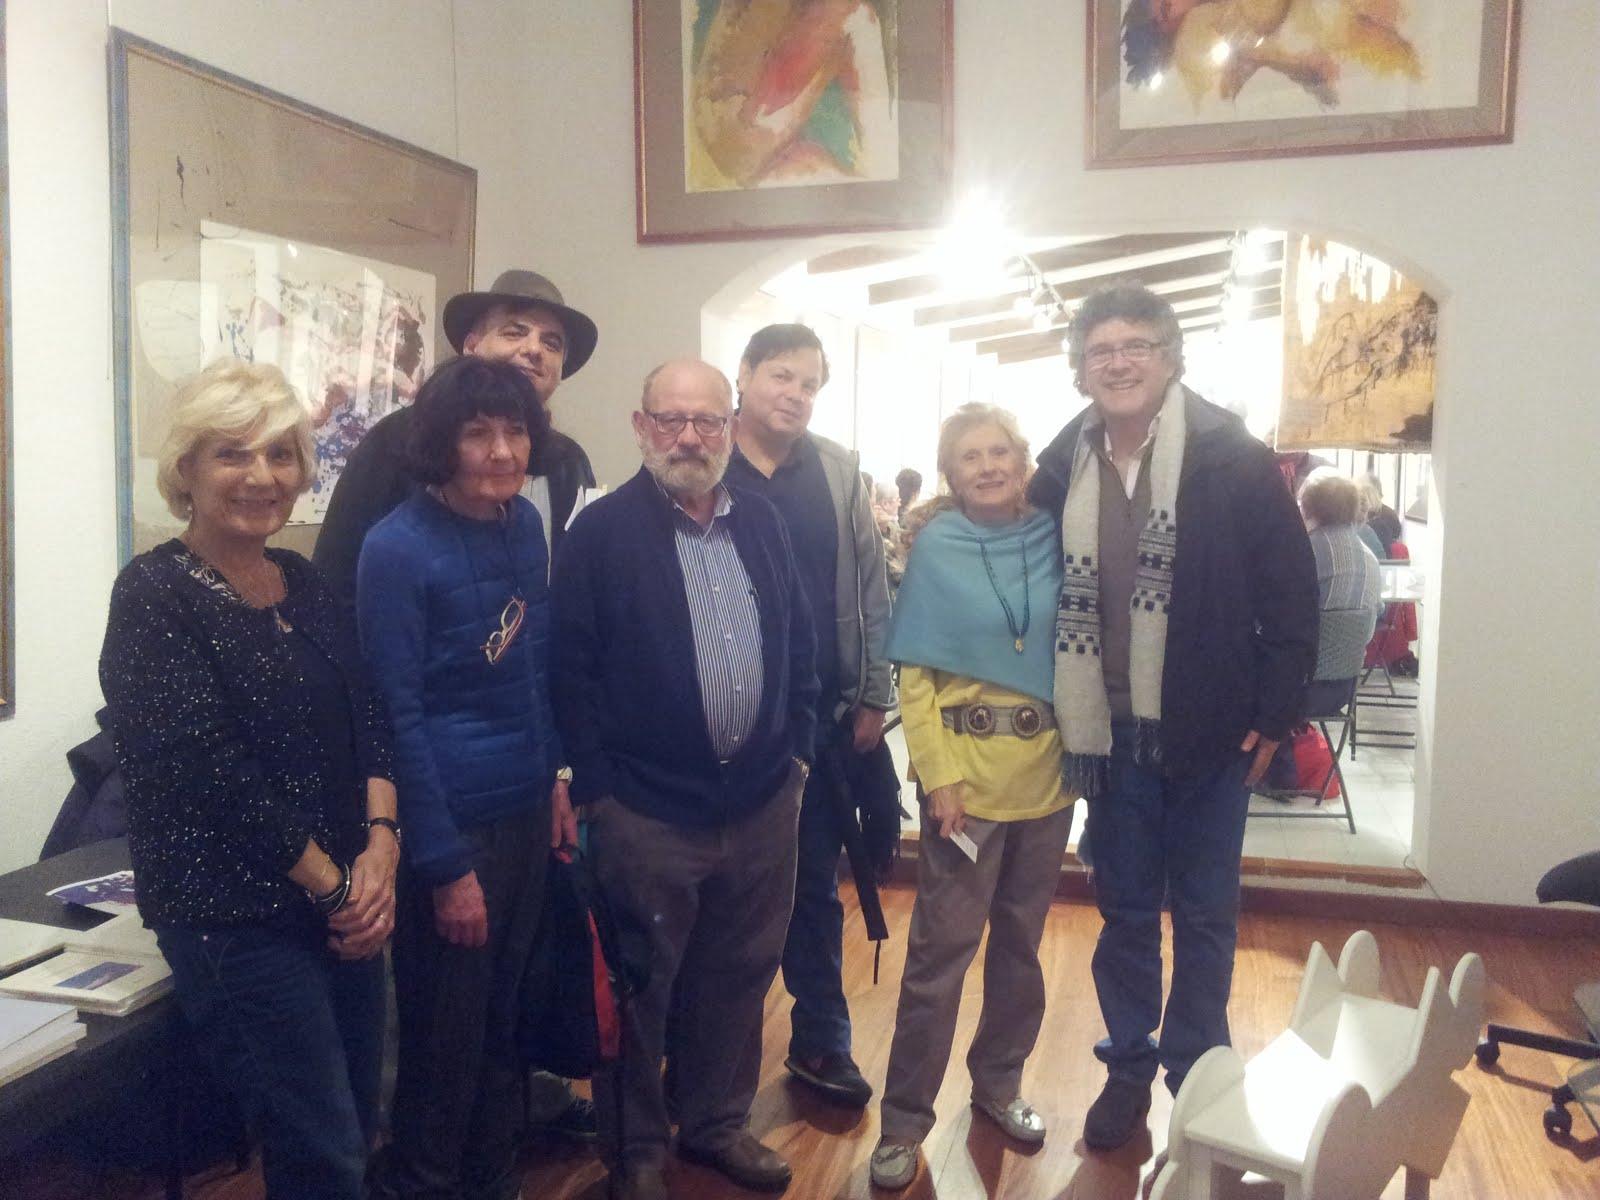 Nicole et Georges Drano, Christophe Corps, Francisco Calderon, Evy Grandie et Patricio Sanchez.